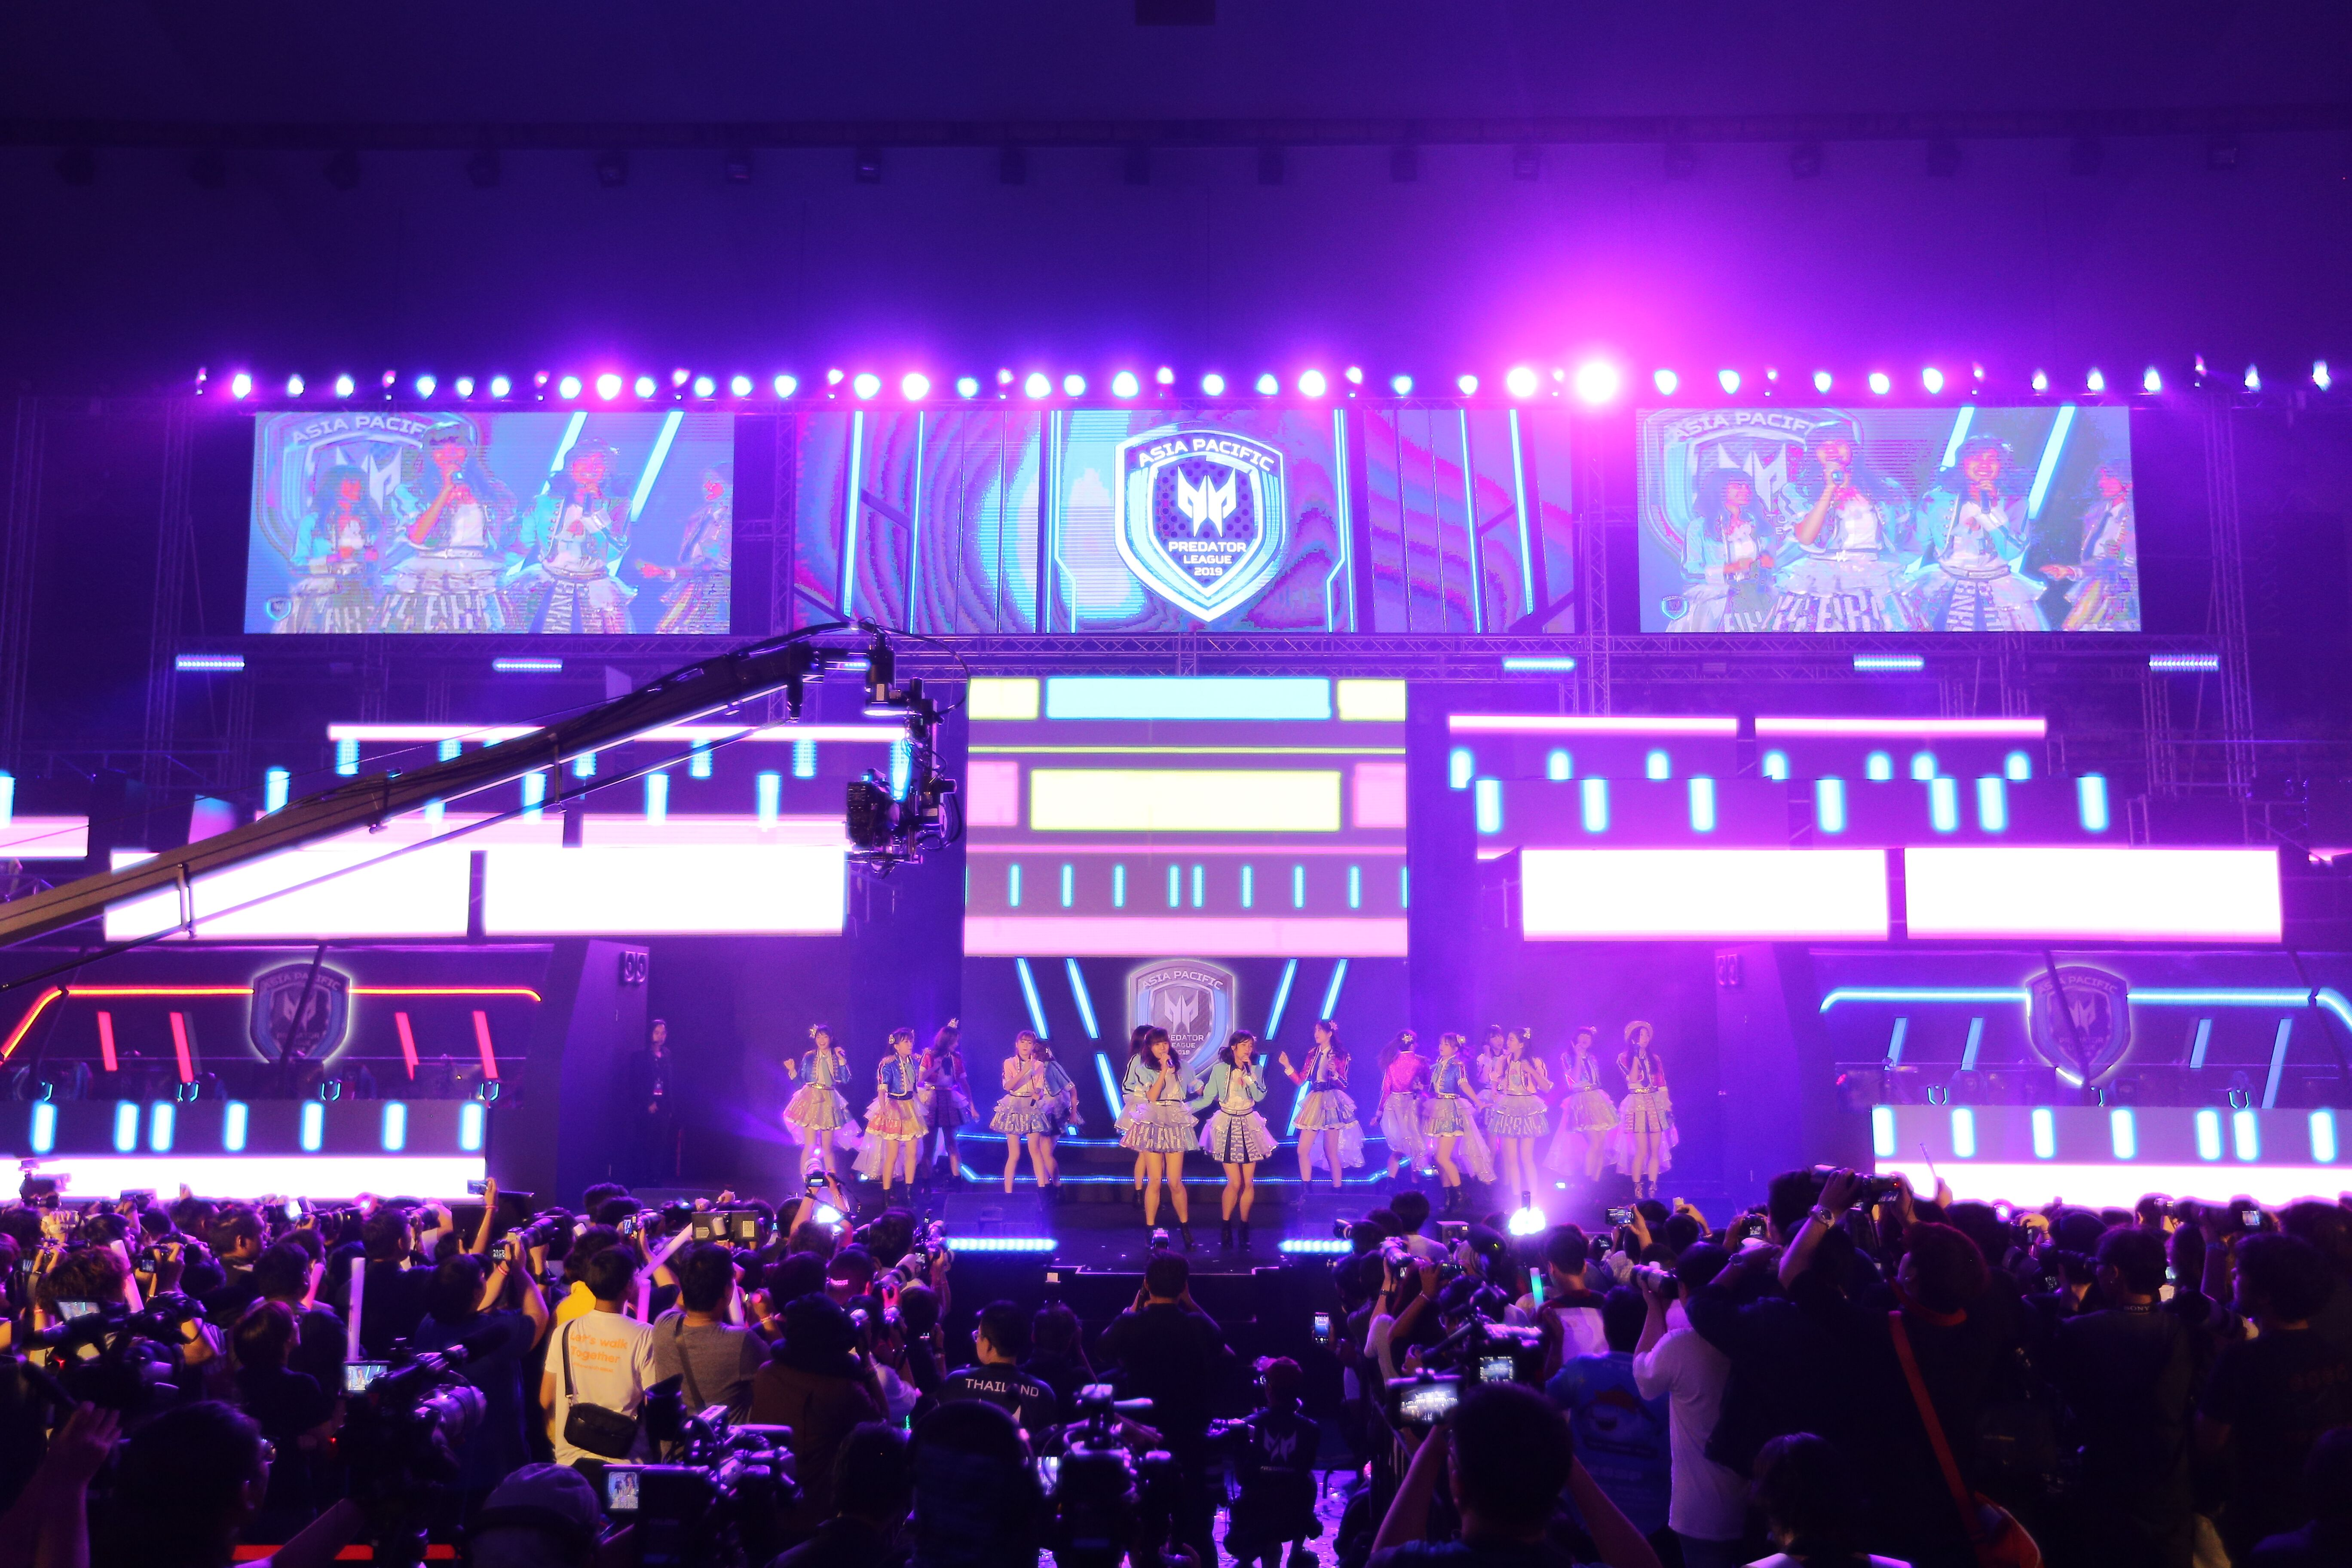 d uh2k w jpeg บรรยากาศงาน Asia Pacific Predator League 2019 สุดยอดขุนพลทีมอีสปอร์ตเข้าร่วมการแข่งขันรอบแกรนด์ไฟนอล